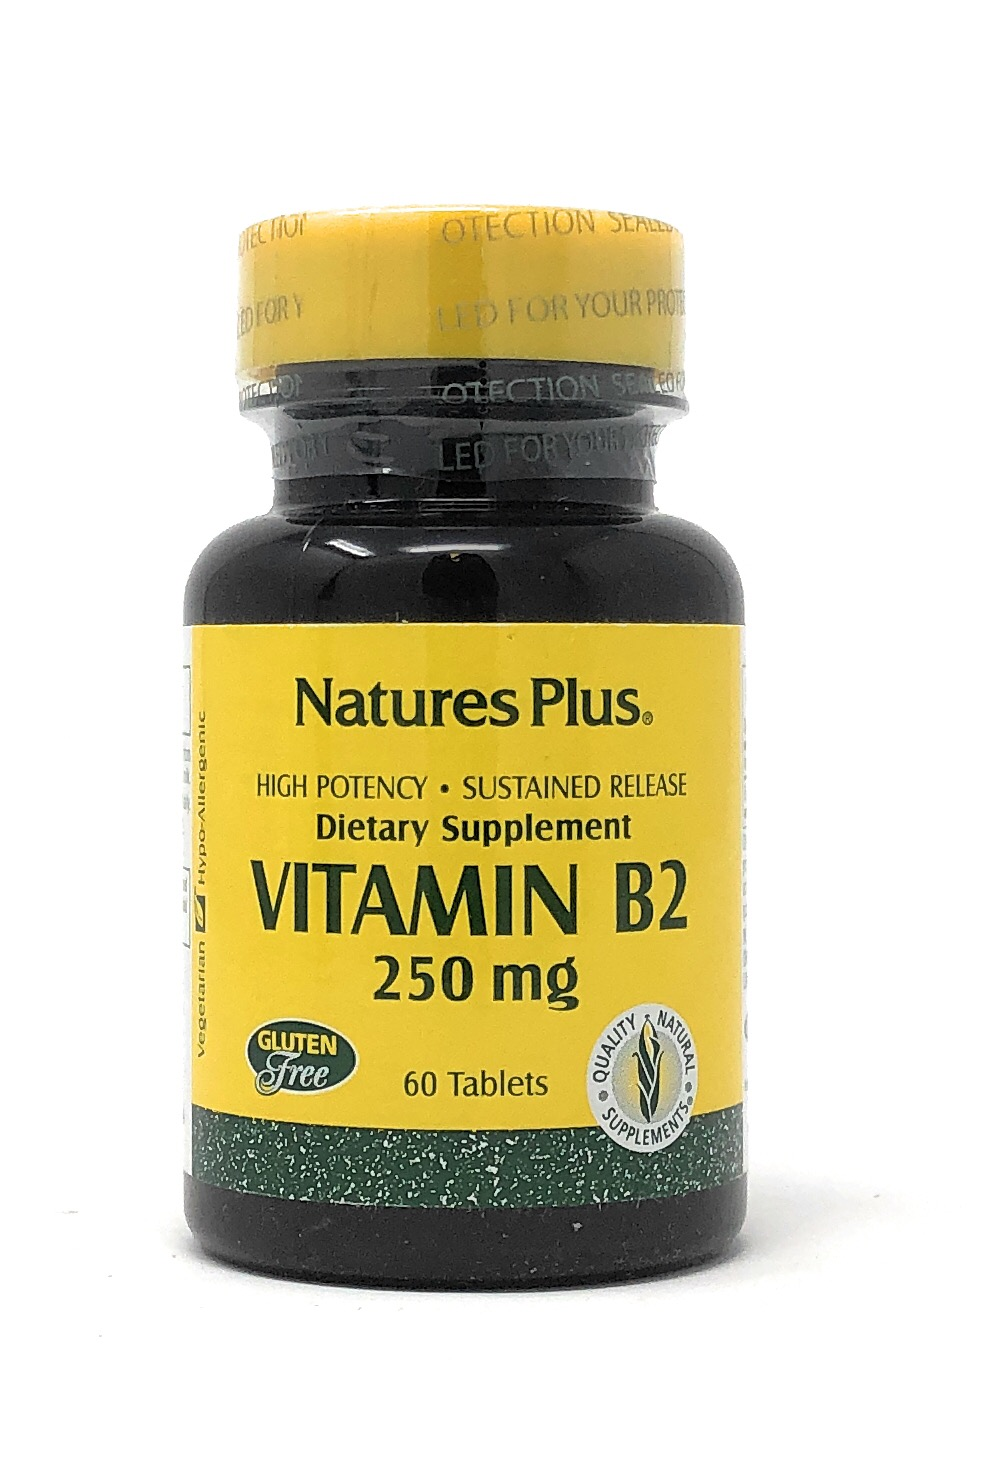 Natures Plus Vitamin B-2 (Riboflavin) 250mg 60 Tabletten S/R (42g)